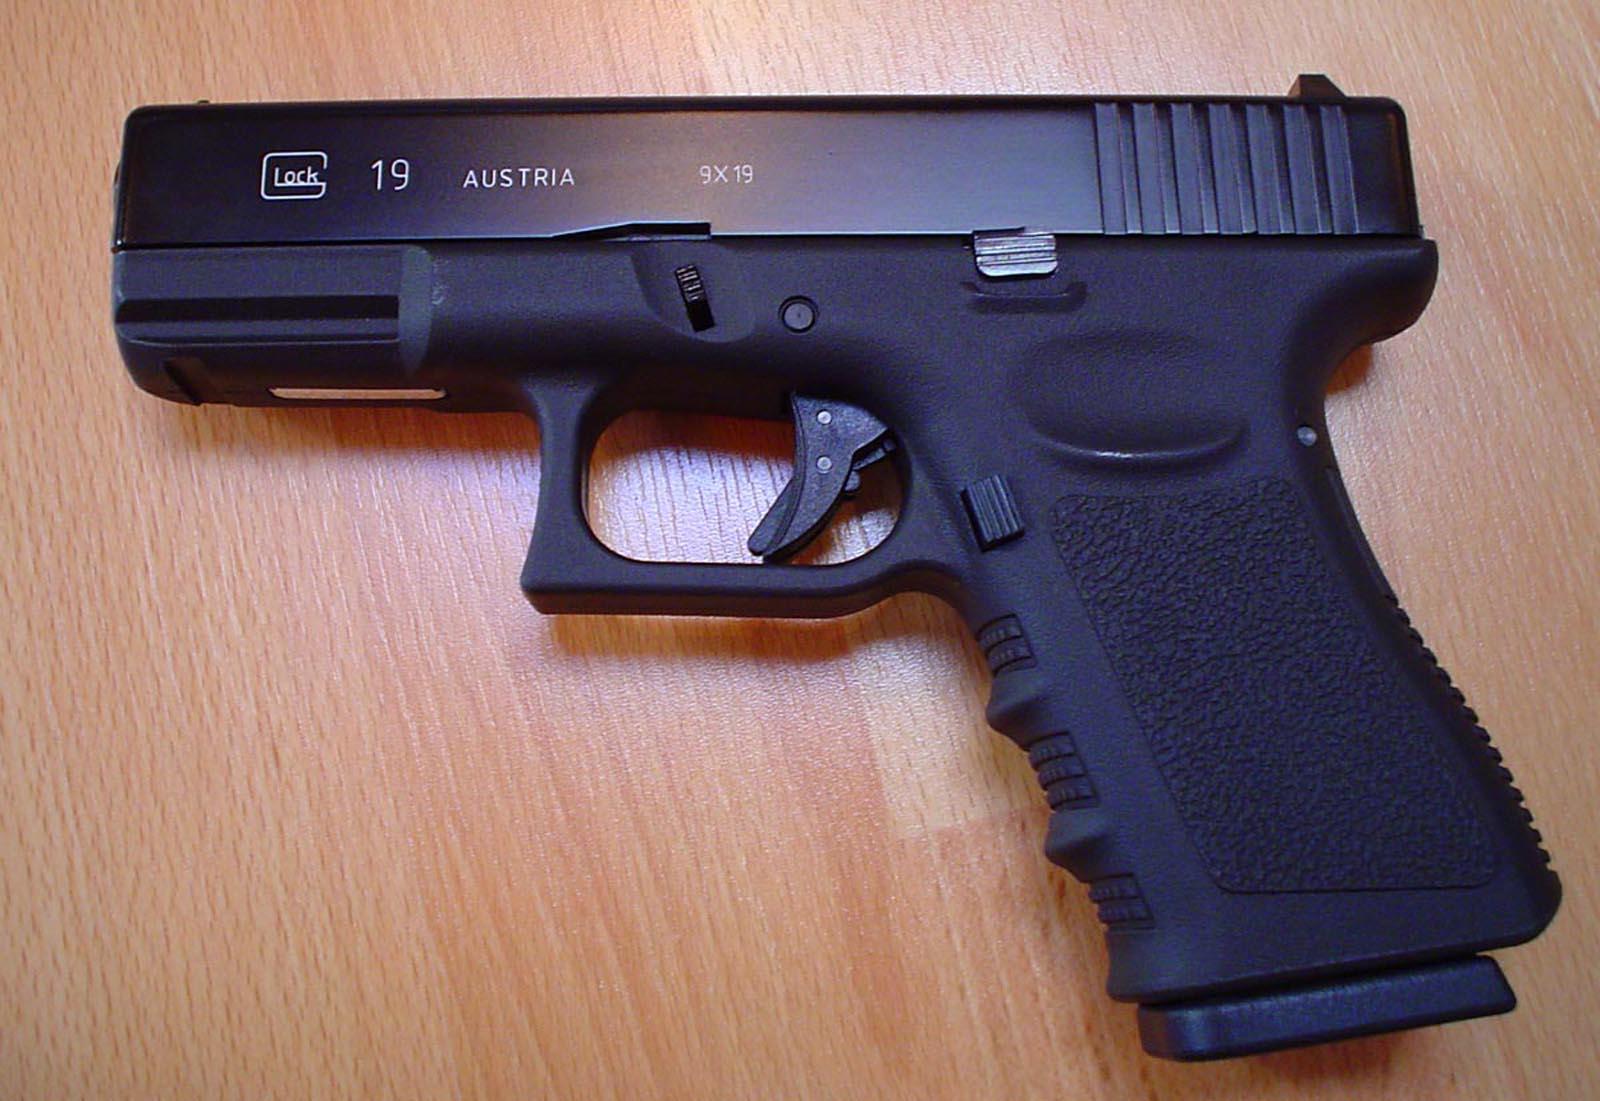 http://4.bp.blogspot.com/-k5pmzqaYSew/Tn1YPaw1FNI/AAAAAAAABTk/uNwLZVPBlbE/s1600/Glock-19_9x19_HD_Gun_pistols_Wallpapers_Vvallpaper.net.jpg